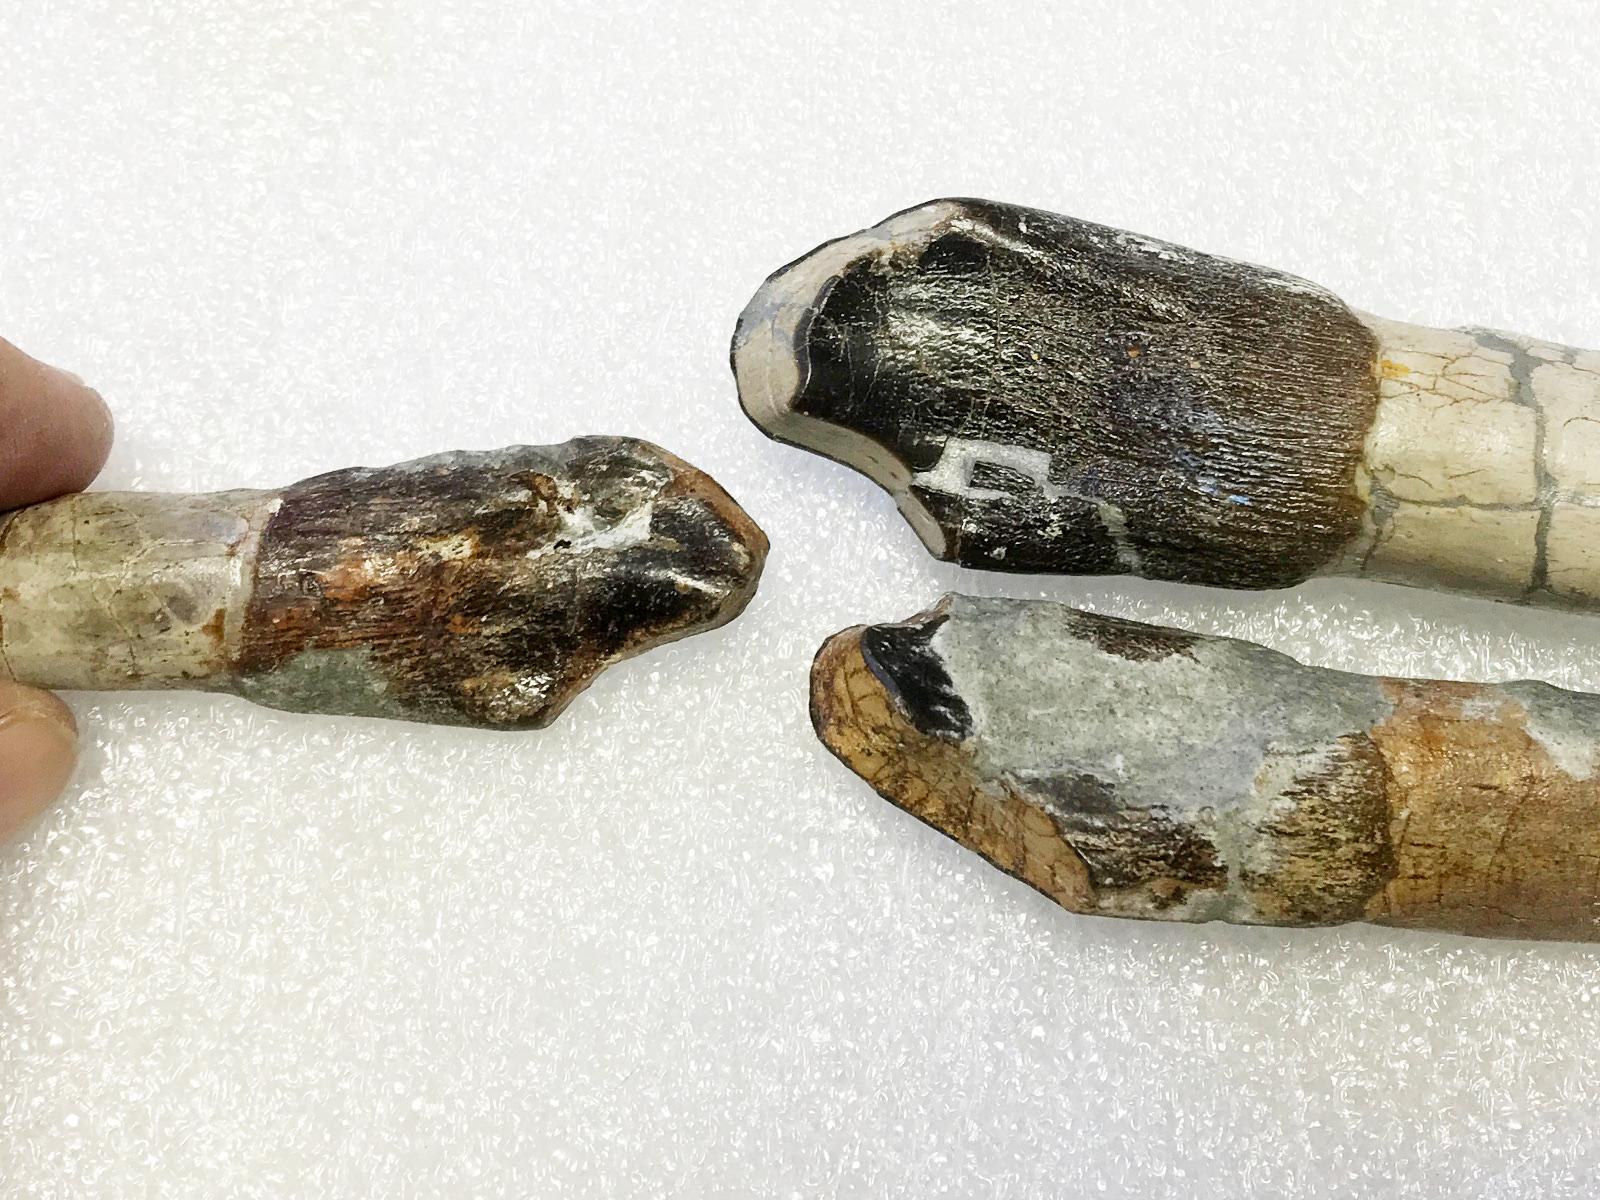 DINO collections - more worn Camarasaurus teeth